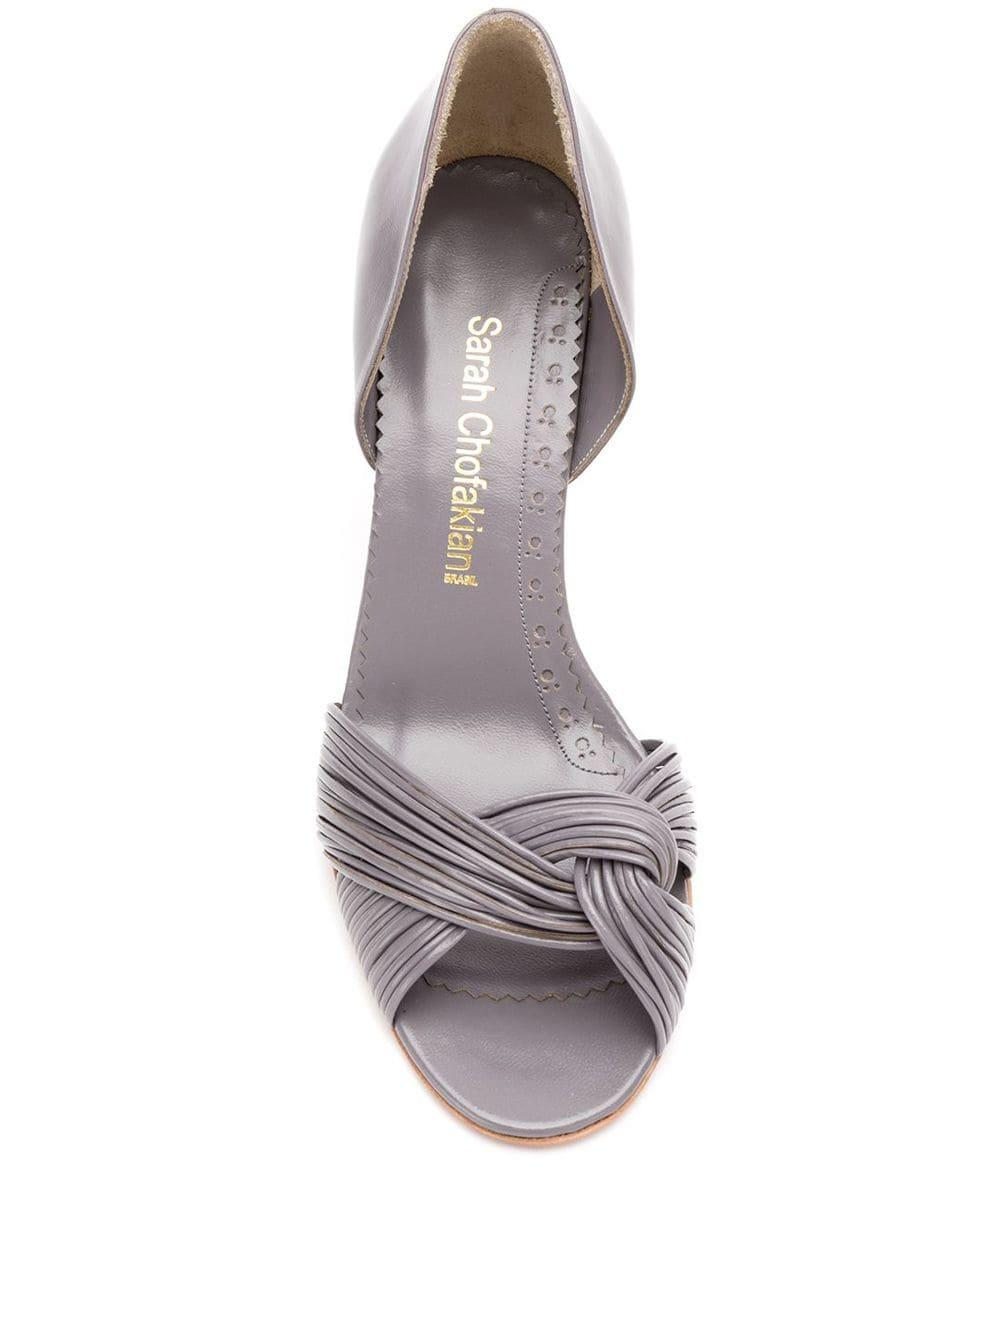 Zapatos de tacón Sarah Chofakian de Cuero de color Rosa